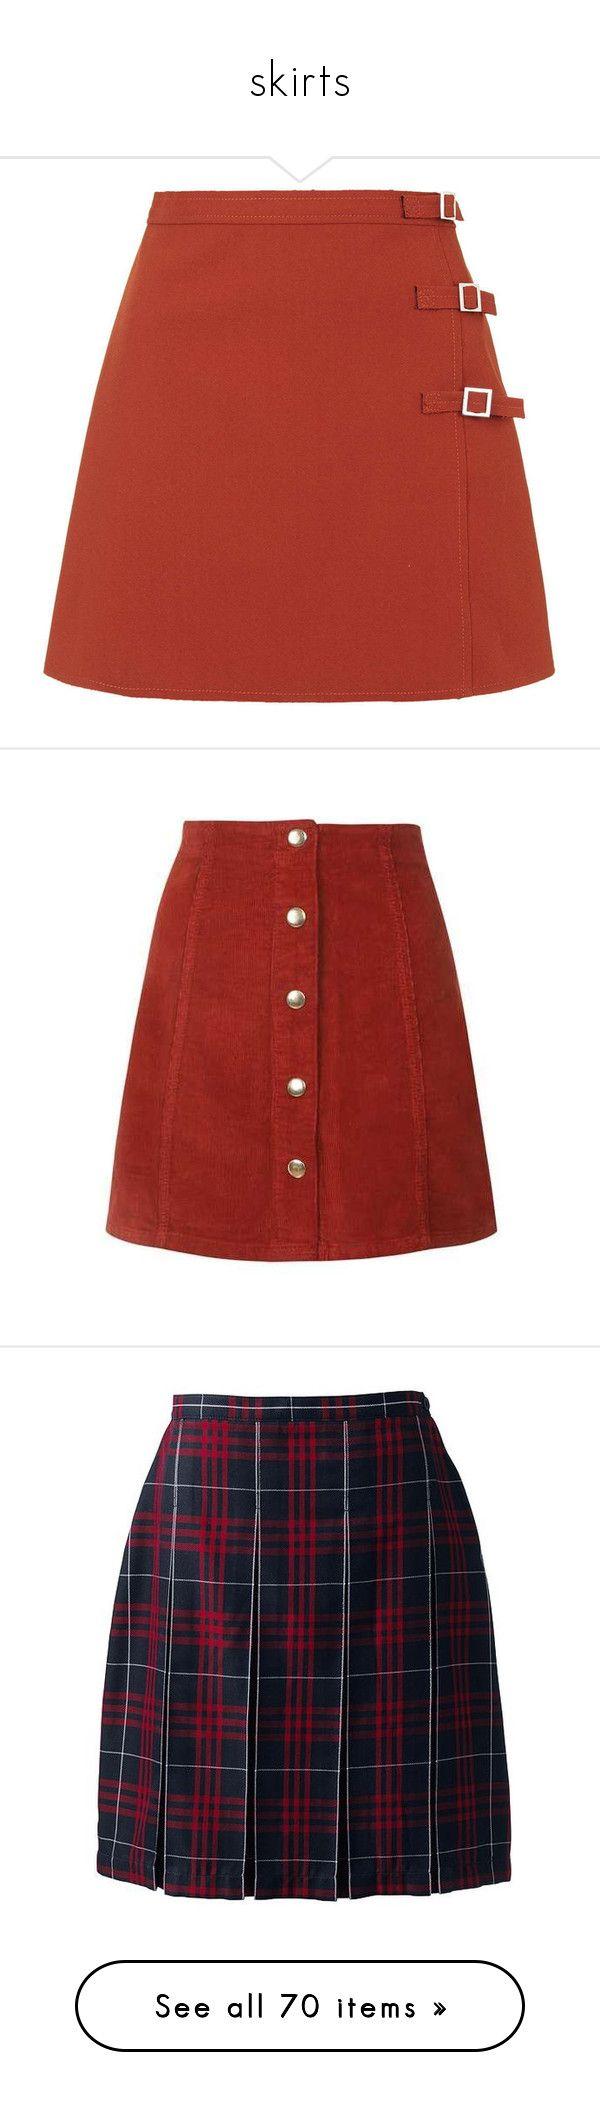 """skirts"" by harthkai on Polyvore featuring skirts, mini skirts, bottoms, topshop, faldas, orange, petite, short a line skirt, petite skirts and red a line skirt"